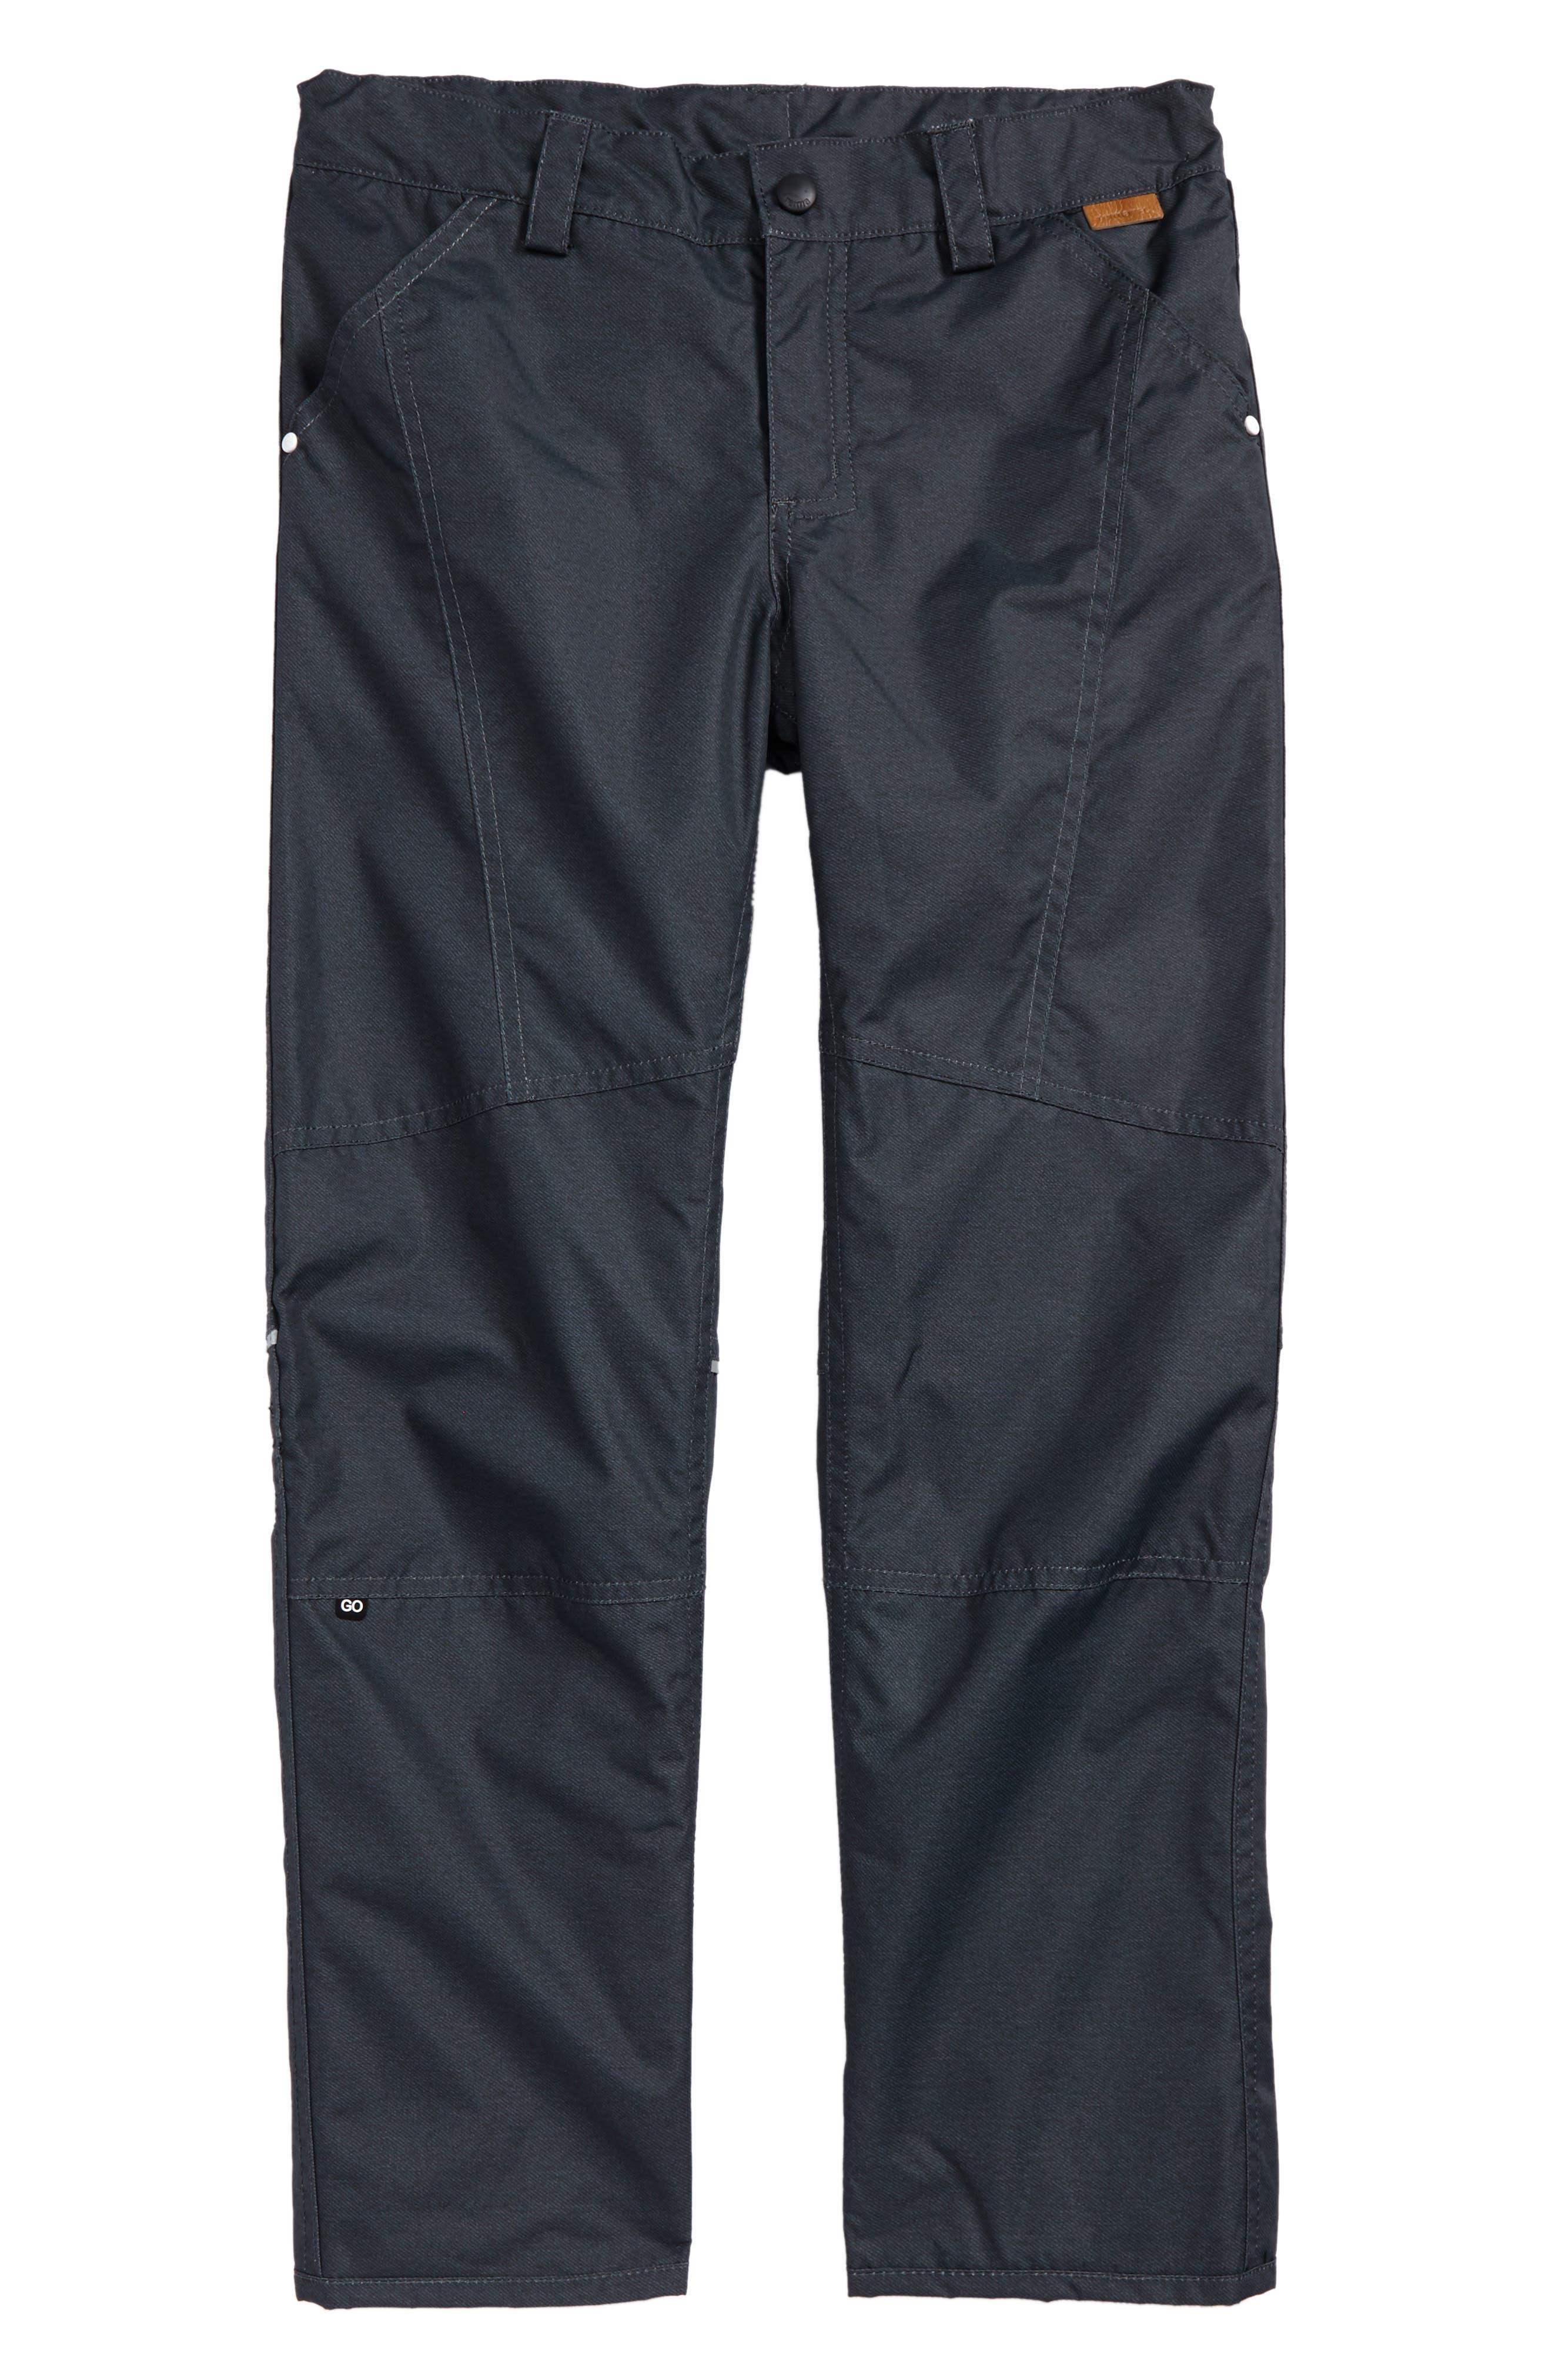 Reimatec<sup>®</sup> Waterproof Pants,                             Main thumbnail 1, color,                             021